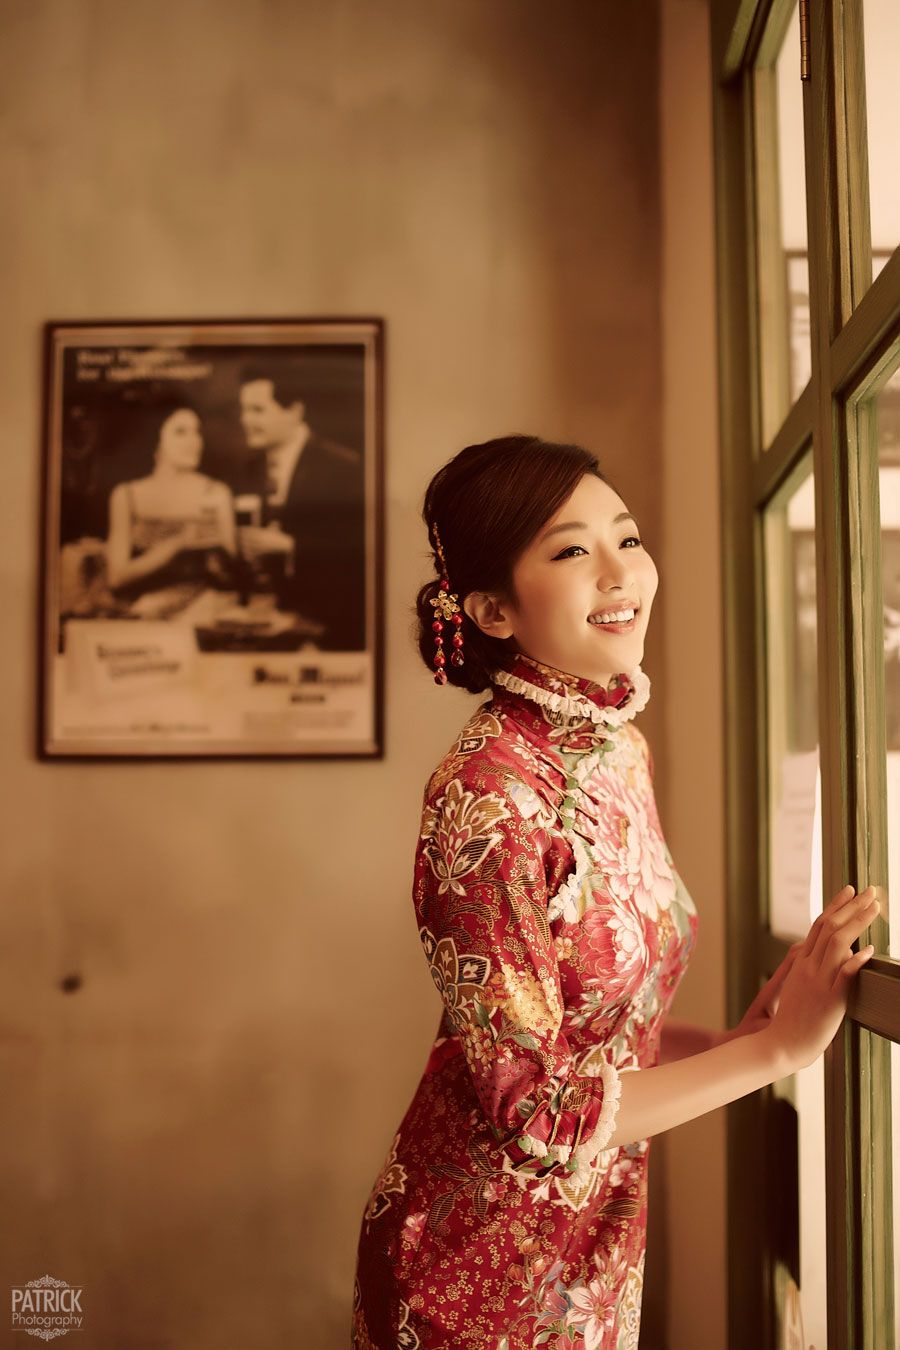 thepron.ru Qipao pron – Sexy Wedding Qipao Shown the pron of Bride